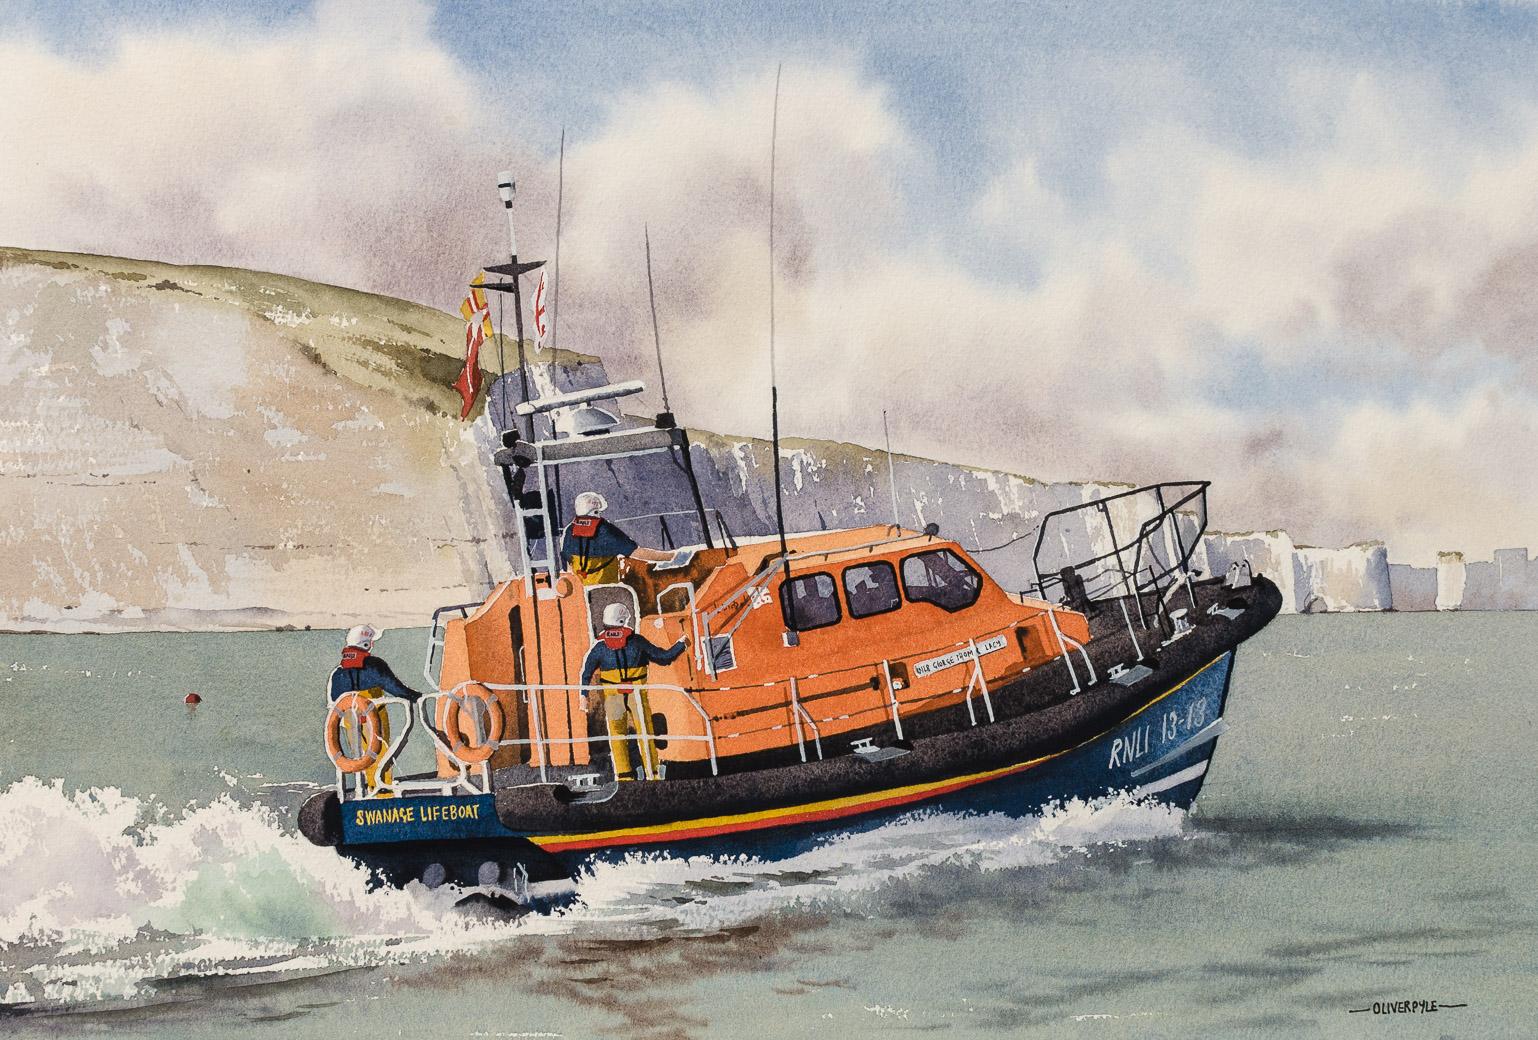 Swanage Lifeboat off Ballard Point